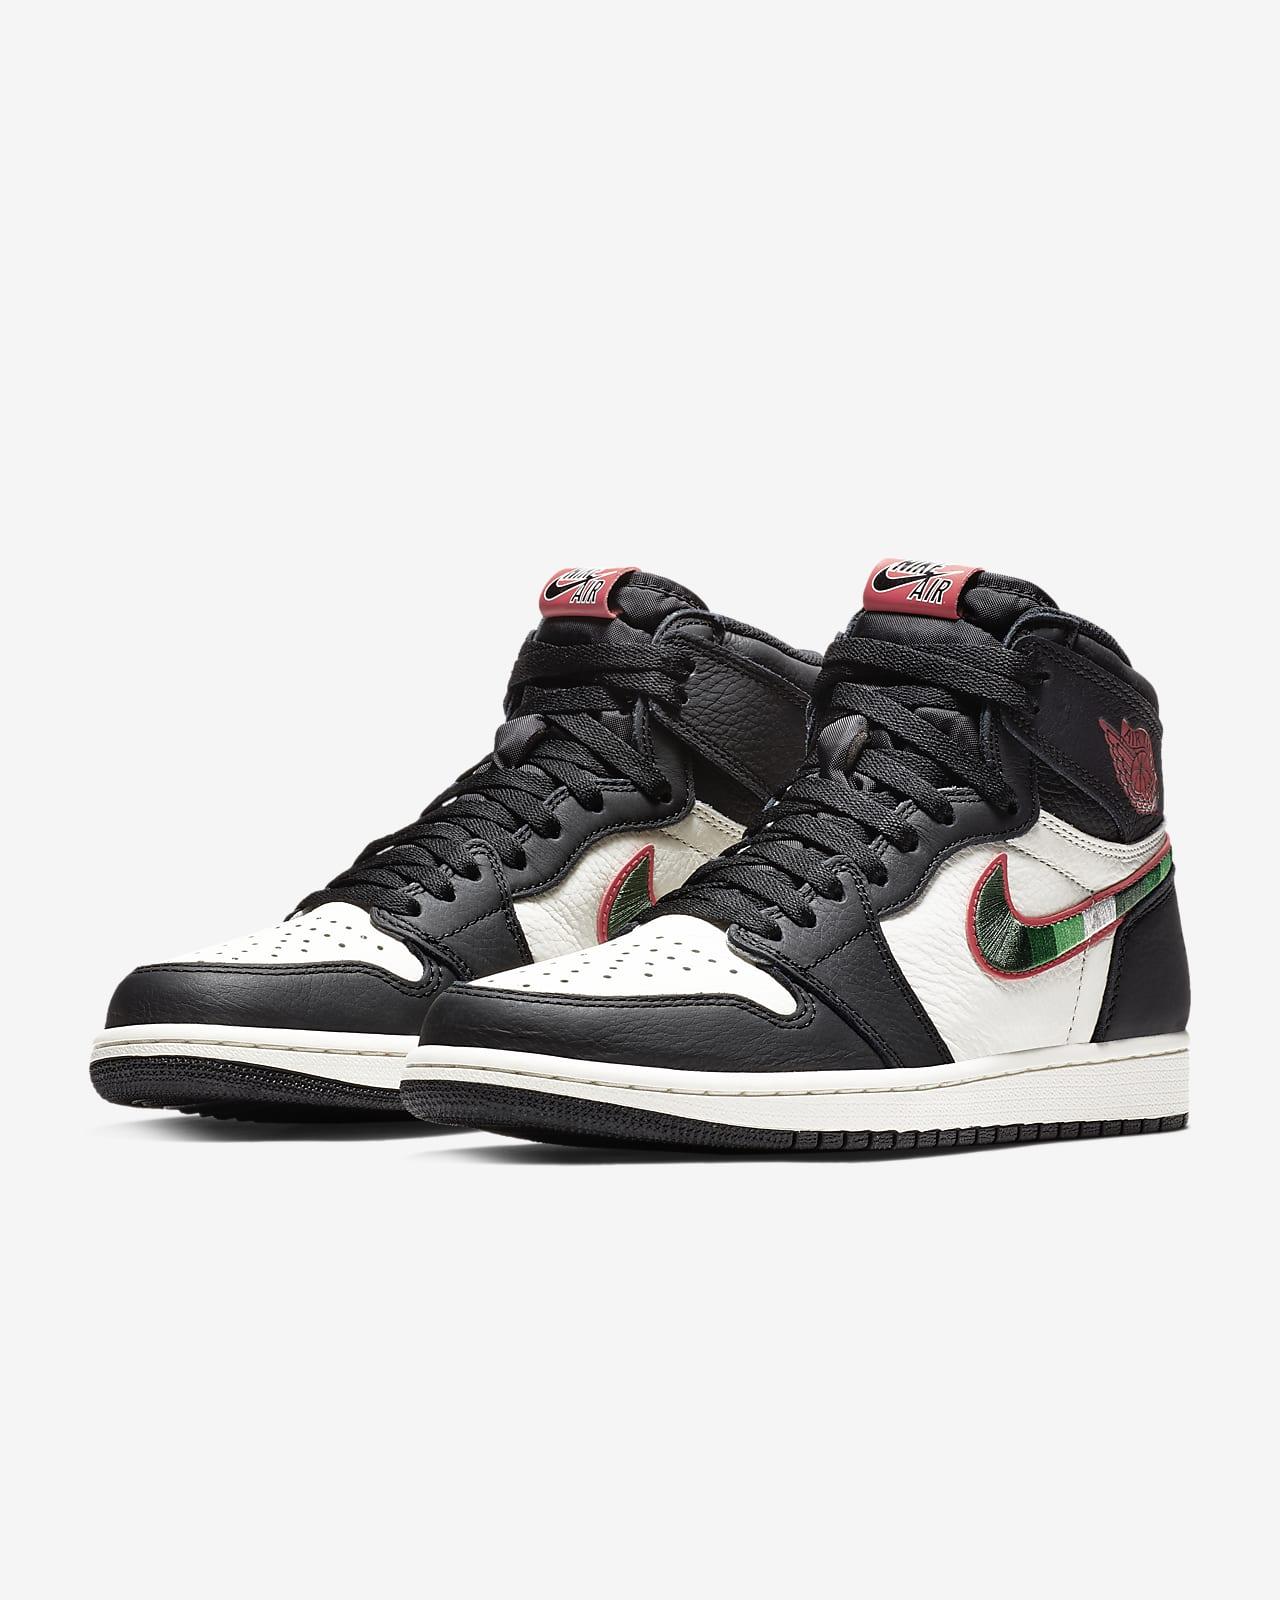 Air Jordan 1 Retro High OG Shoe. Nike SG